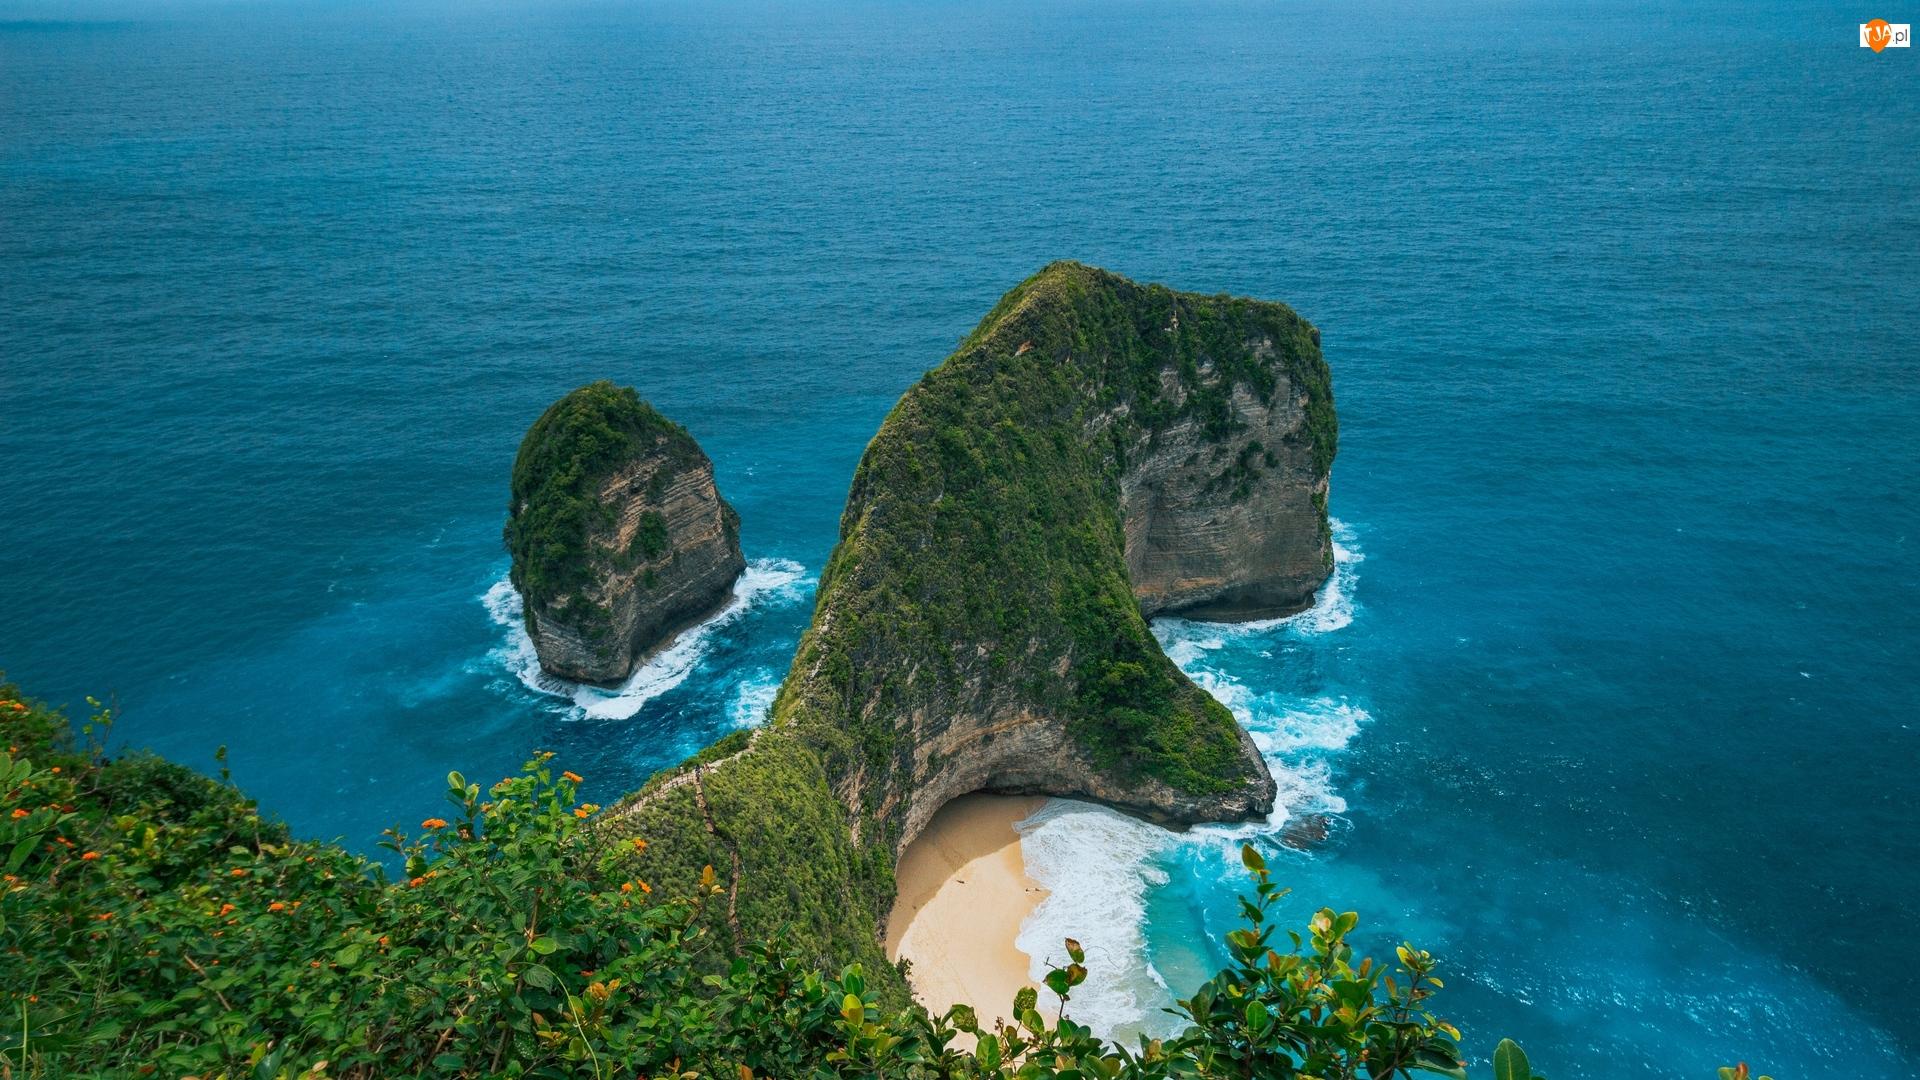 Klif, Plaża Kelingking Beach, Indonezja, Skały, Nusa Penida, Roślinność, Morze